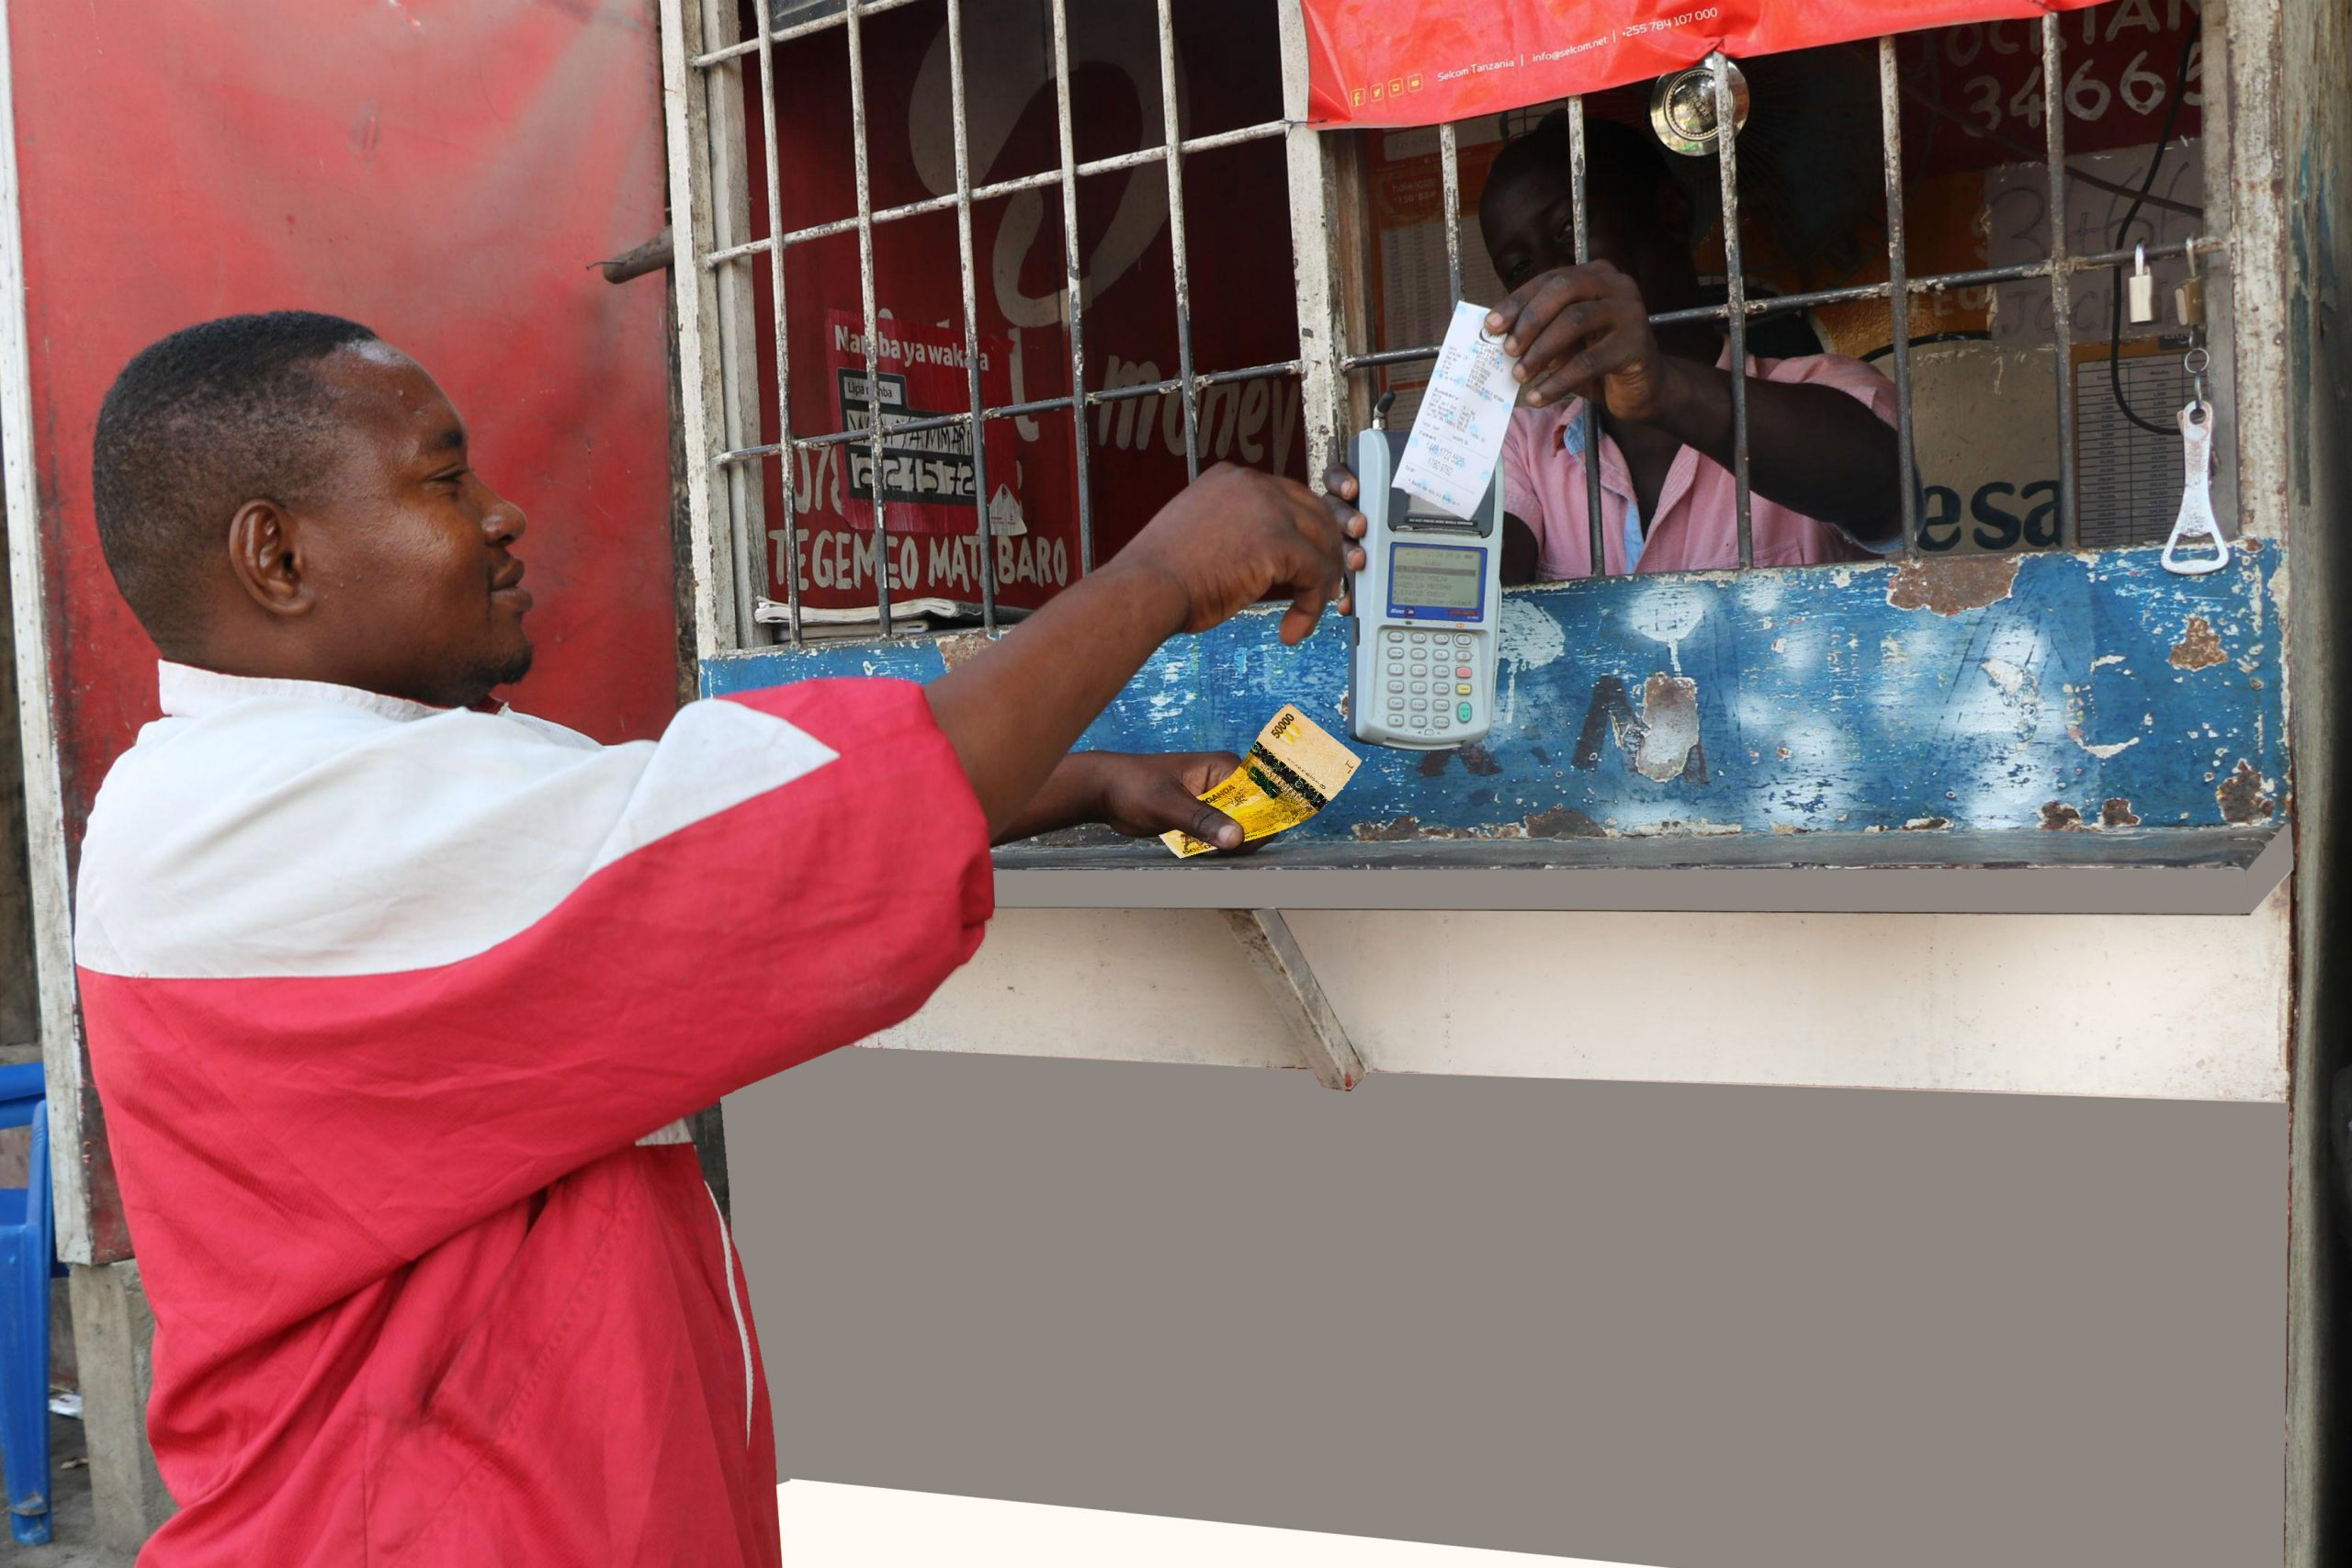 Man conducting banking transaction at a kiosk through Agency banking